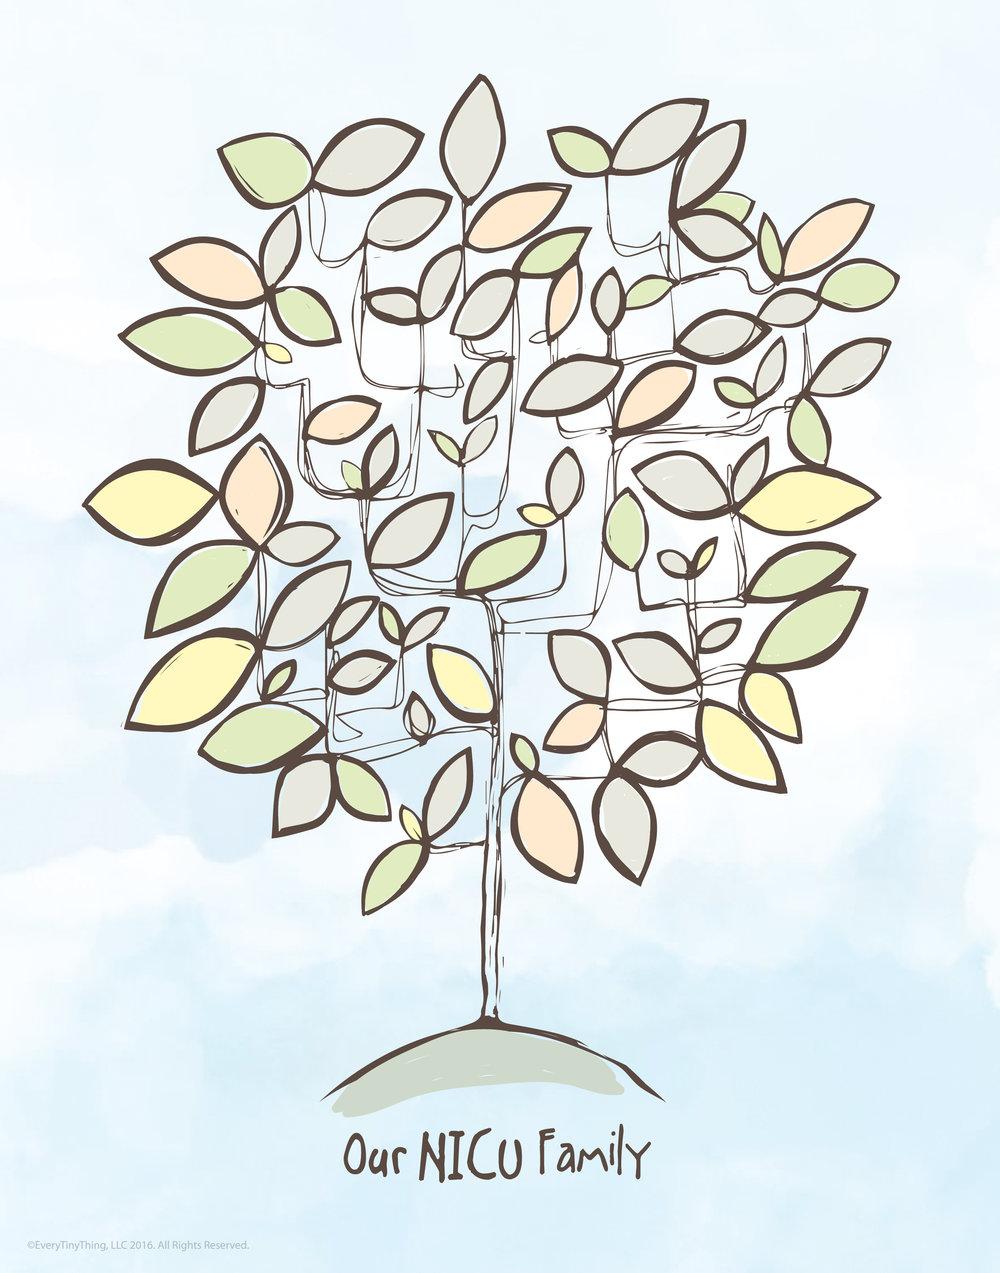 NICU Poster for preemies